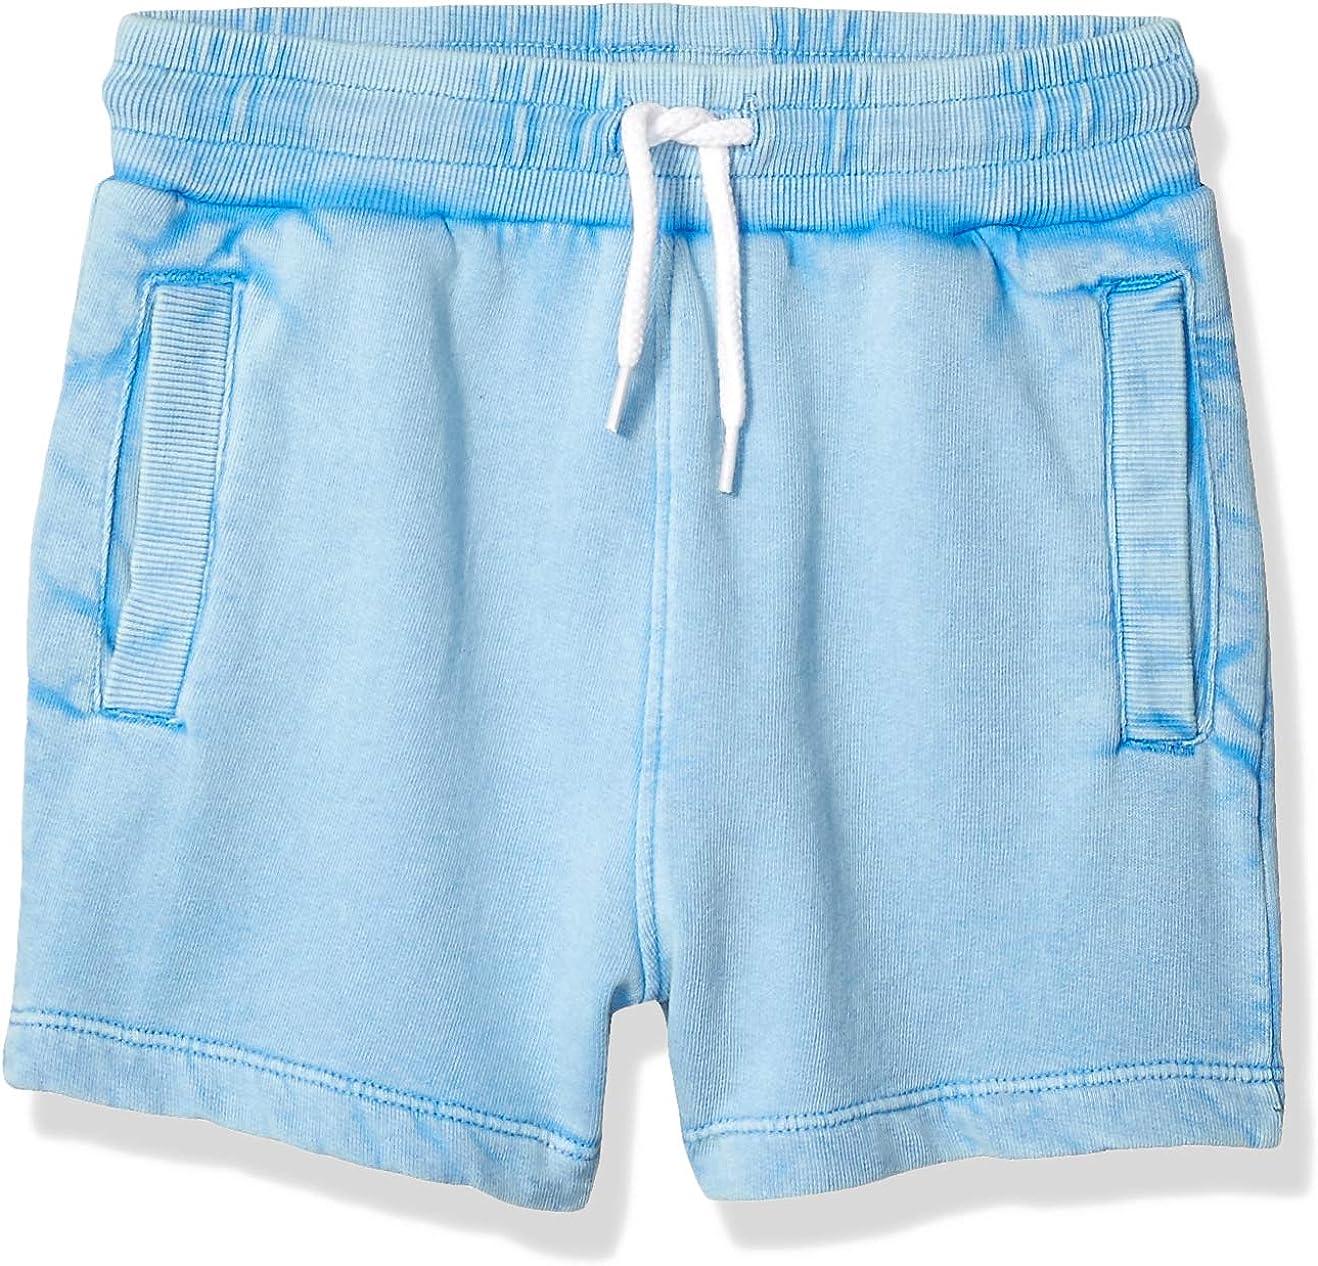 Stylish and Fun Petit Lem Big Pants for Boys